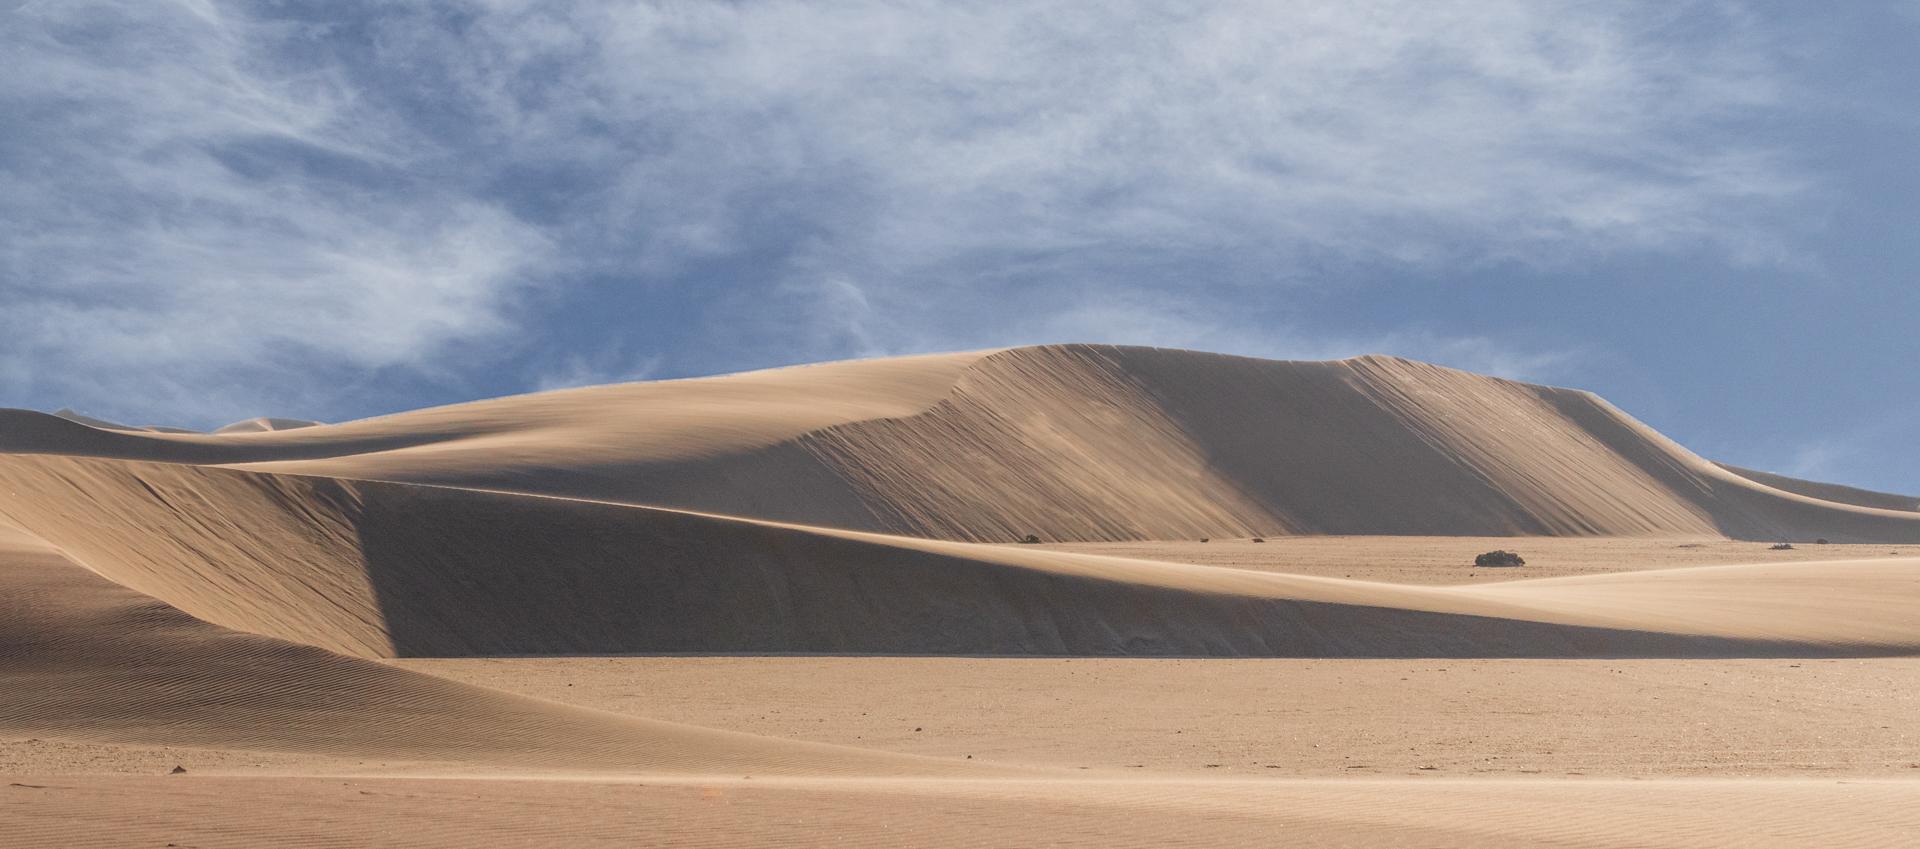 Namibian Dune